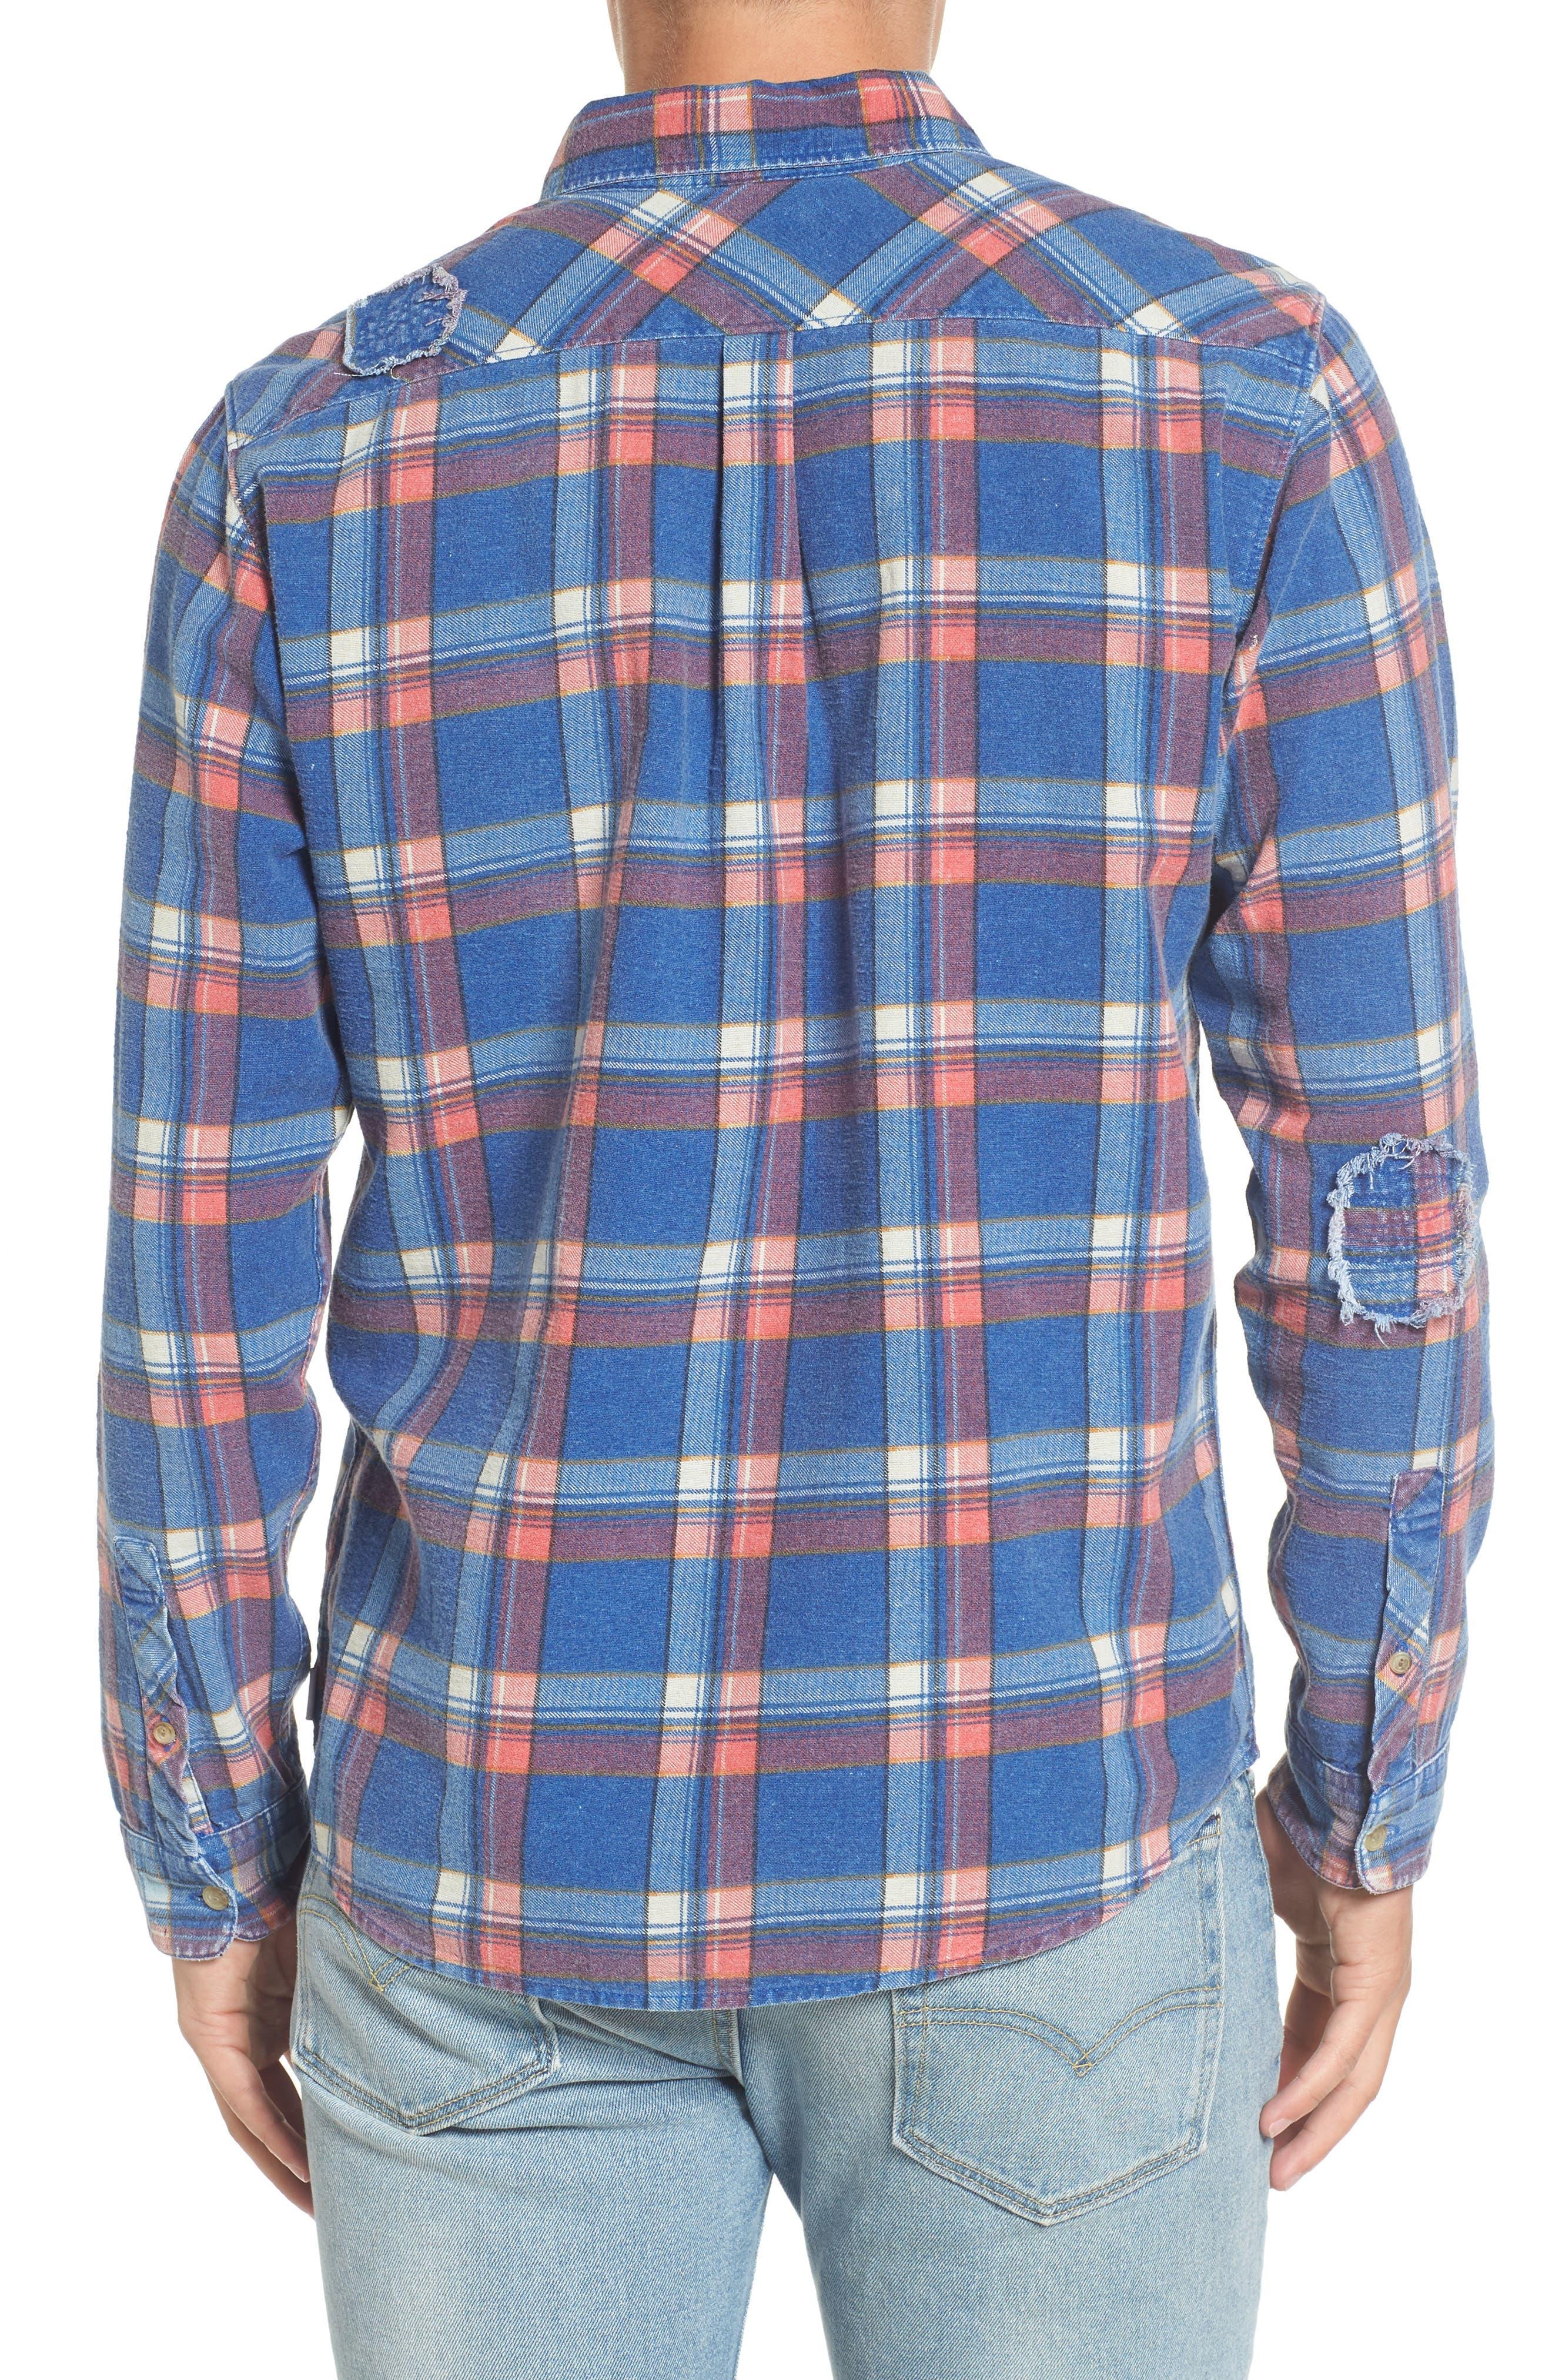 x Kevin Long Plaid Shirt,                             Alternate thumbnail 2, color,                             462